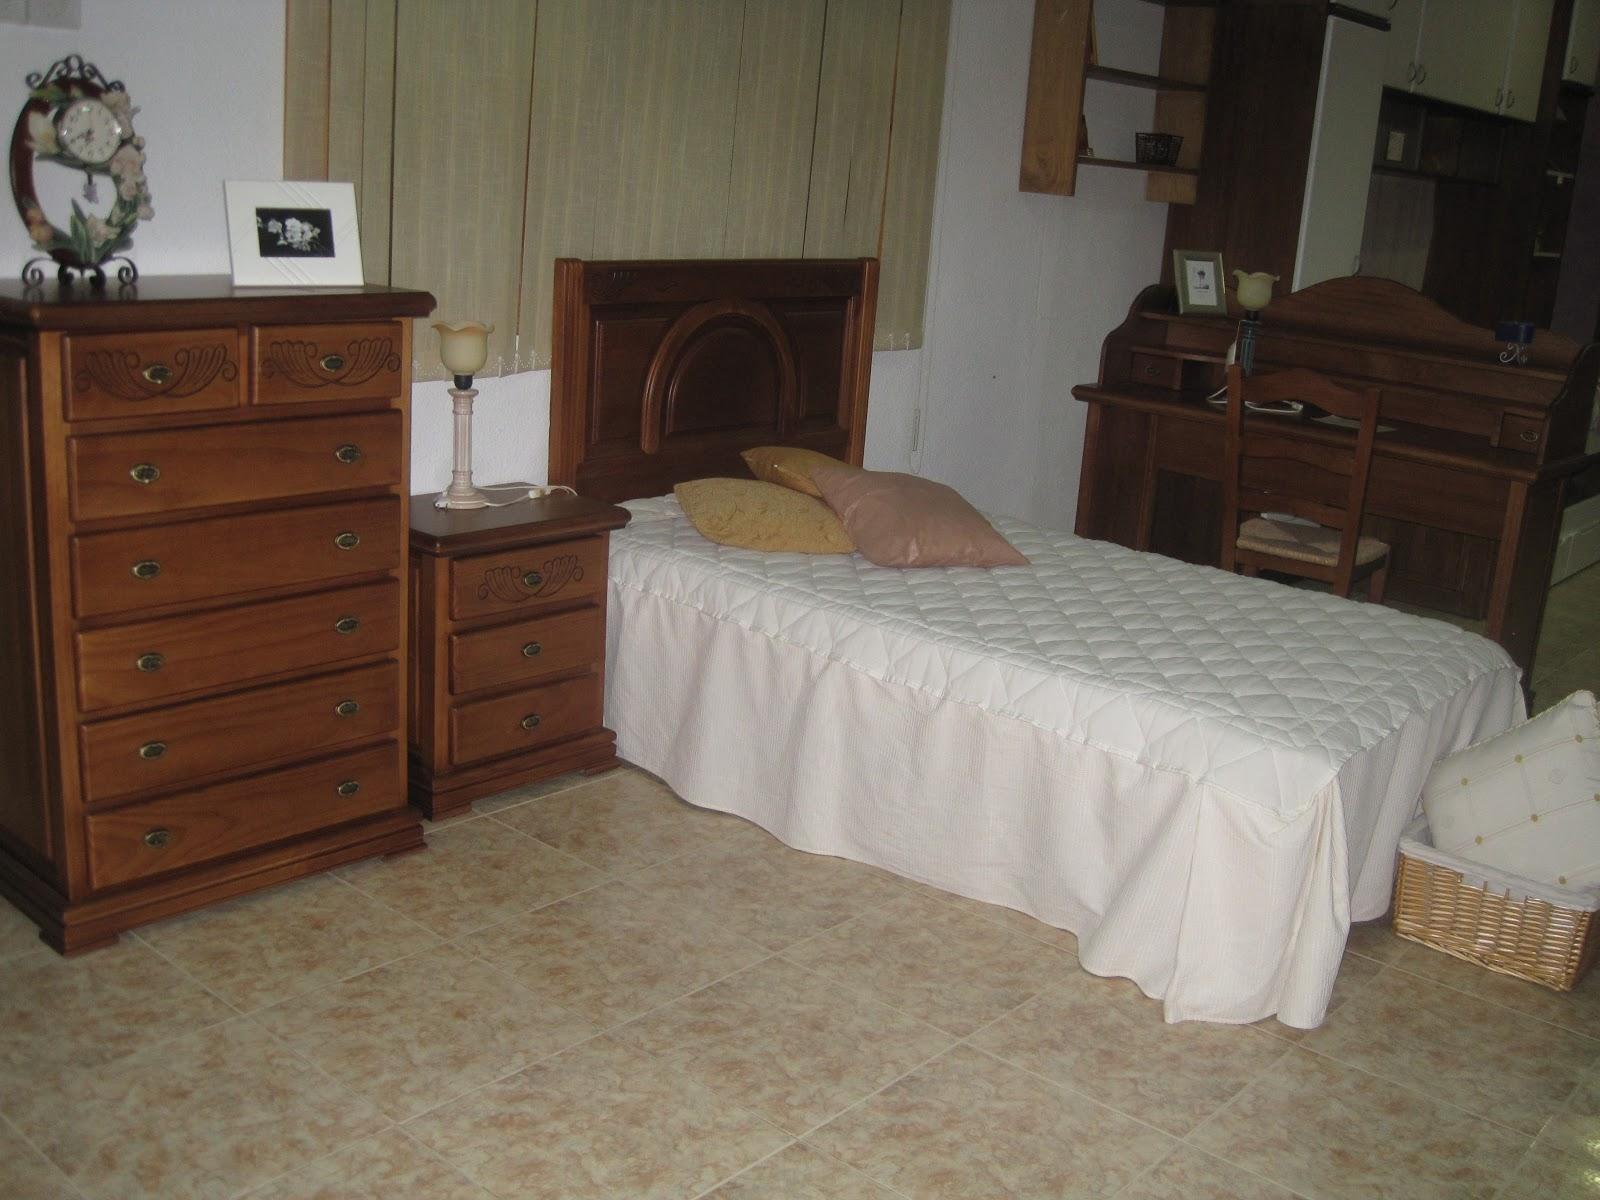 Muebles arcecoll dormitorio juvenil cl sico - Dormitorio juvenil clasico ...